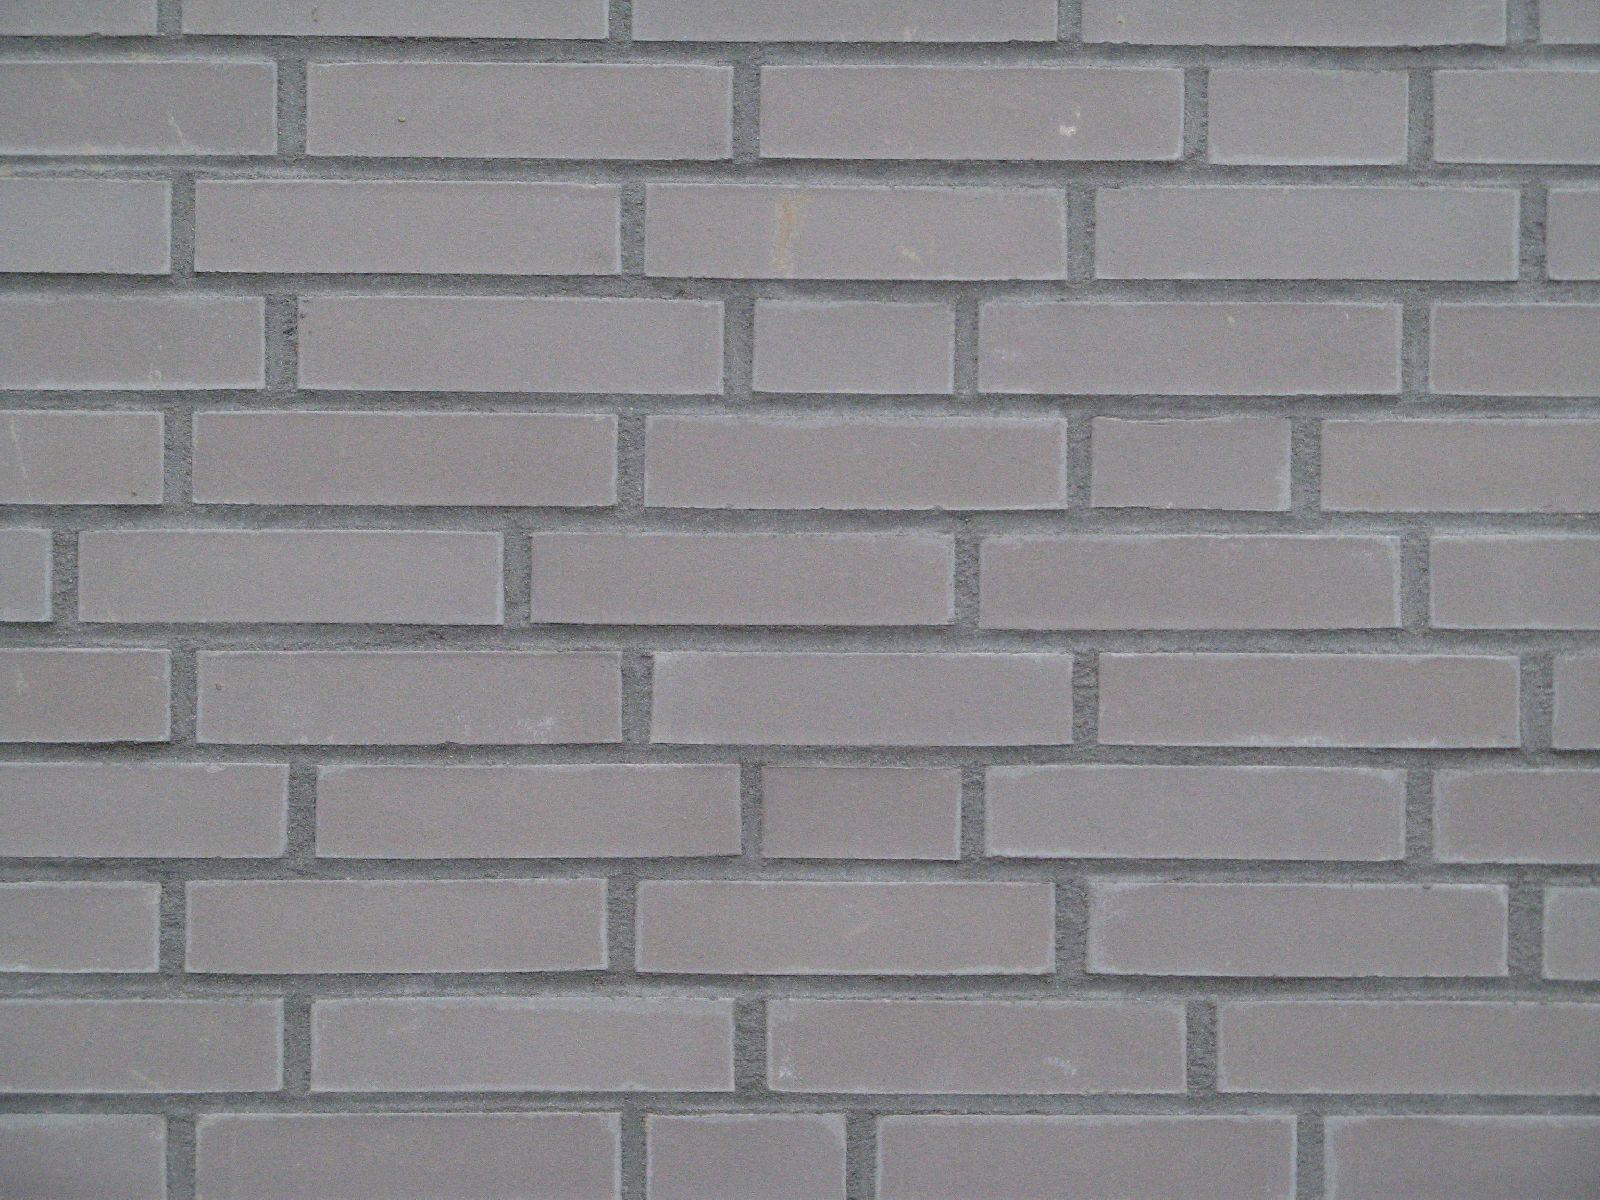 Brick_Texture_B_5879